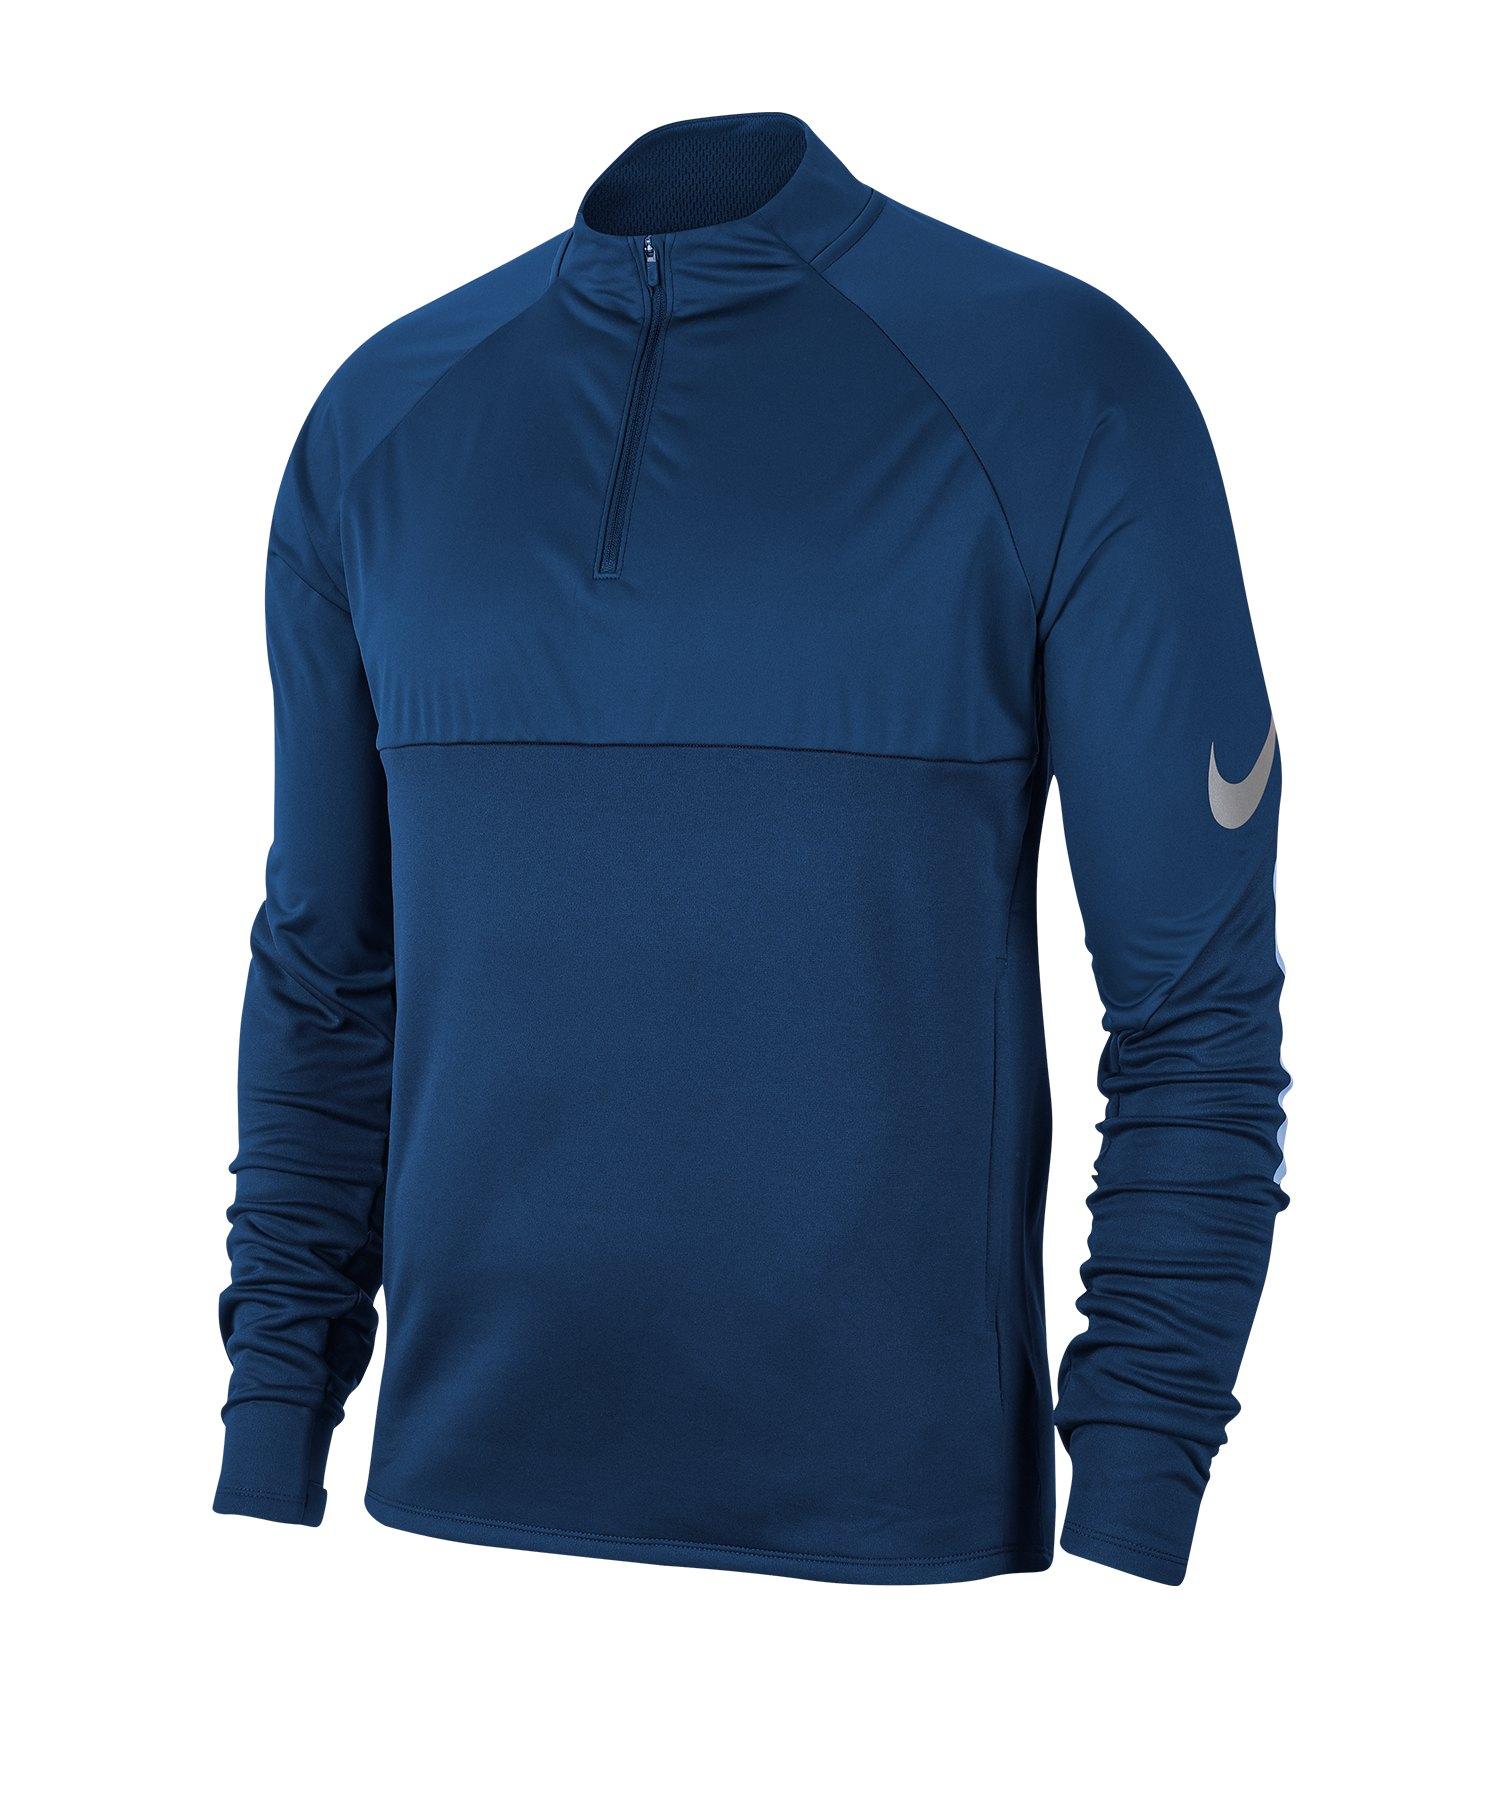 Nike Therma 1/4 Zip Trainingsweatshirt Blau F407 - blau